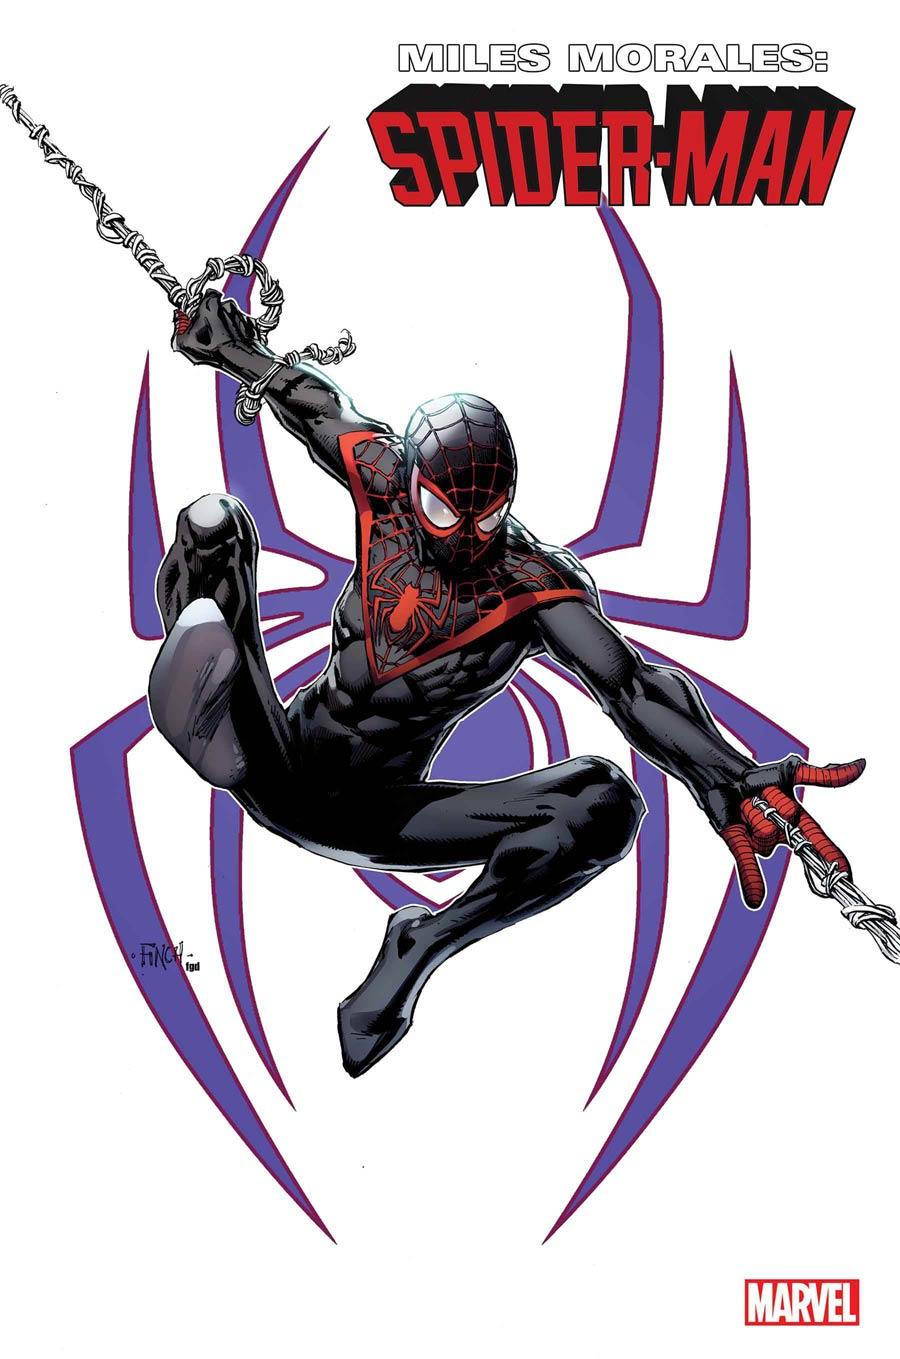 Miles Morales Spider-Man #23 Cover C Incentive David Finch Miles Morales Variant Cover (King In Black Tie-In)